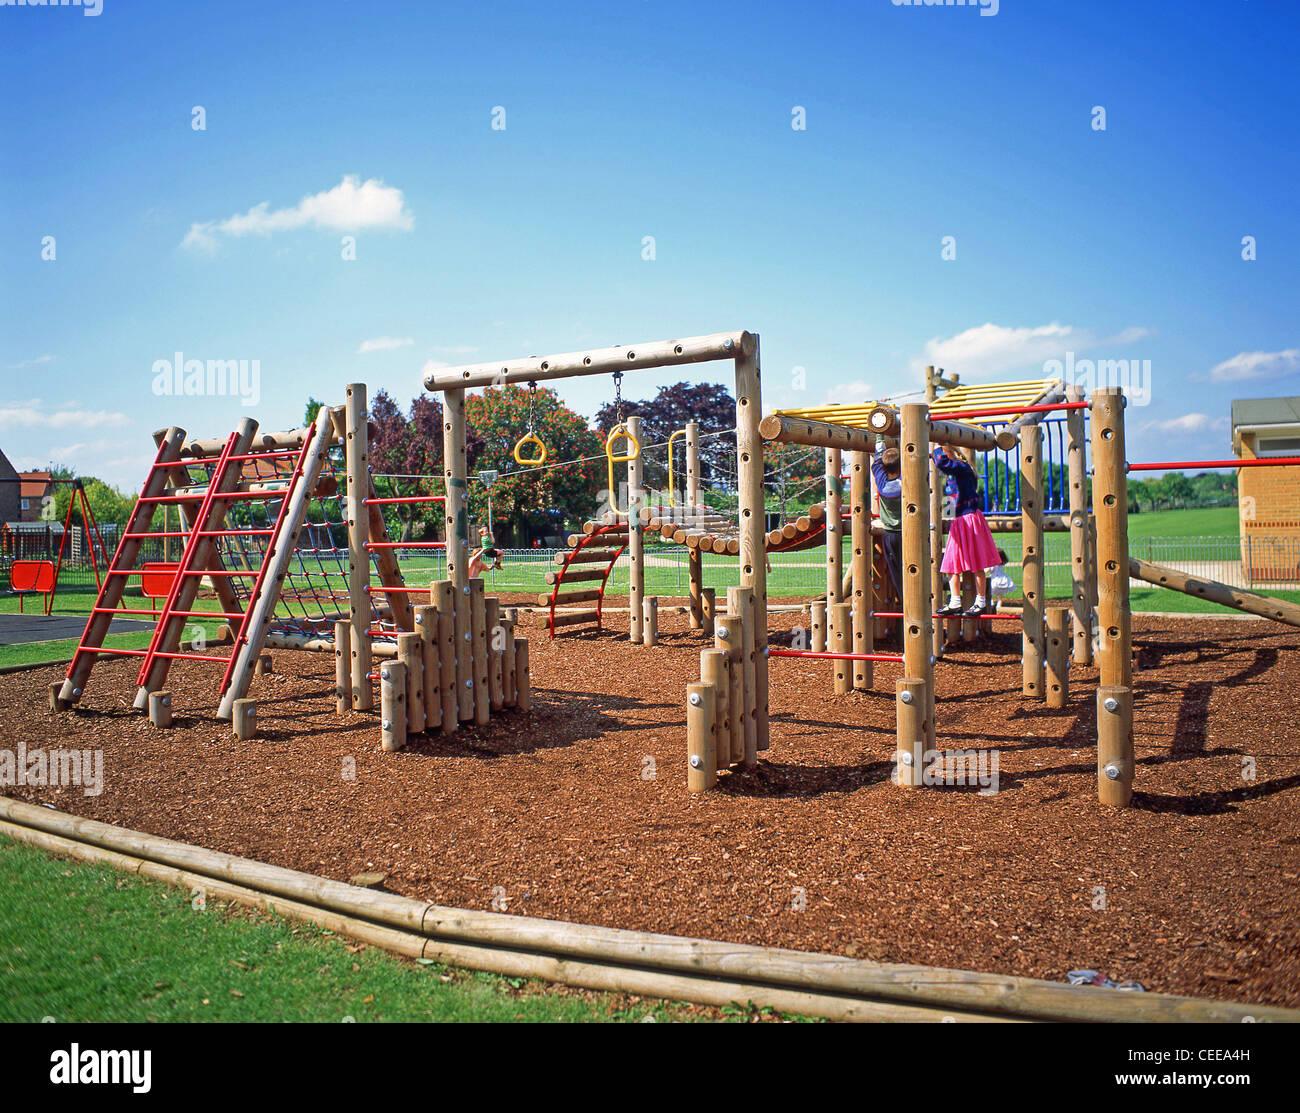 Children's outdoor playground, Winkfield, Berkshire, England, United Kingdom Stock Photo